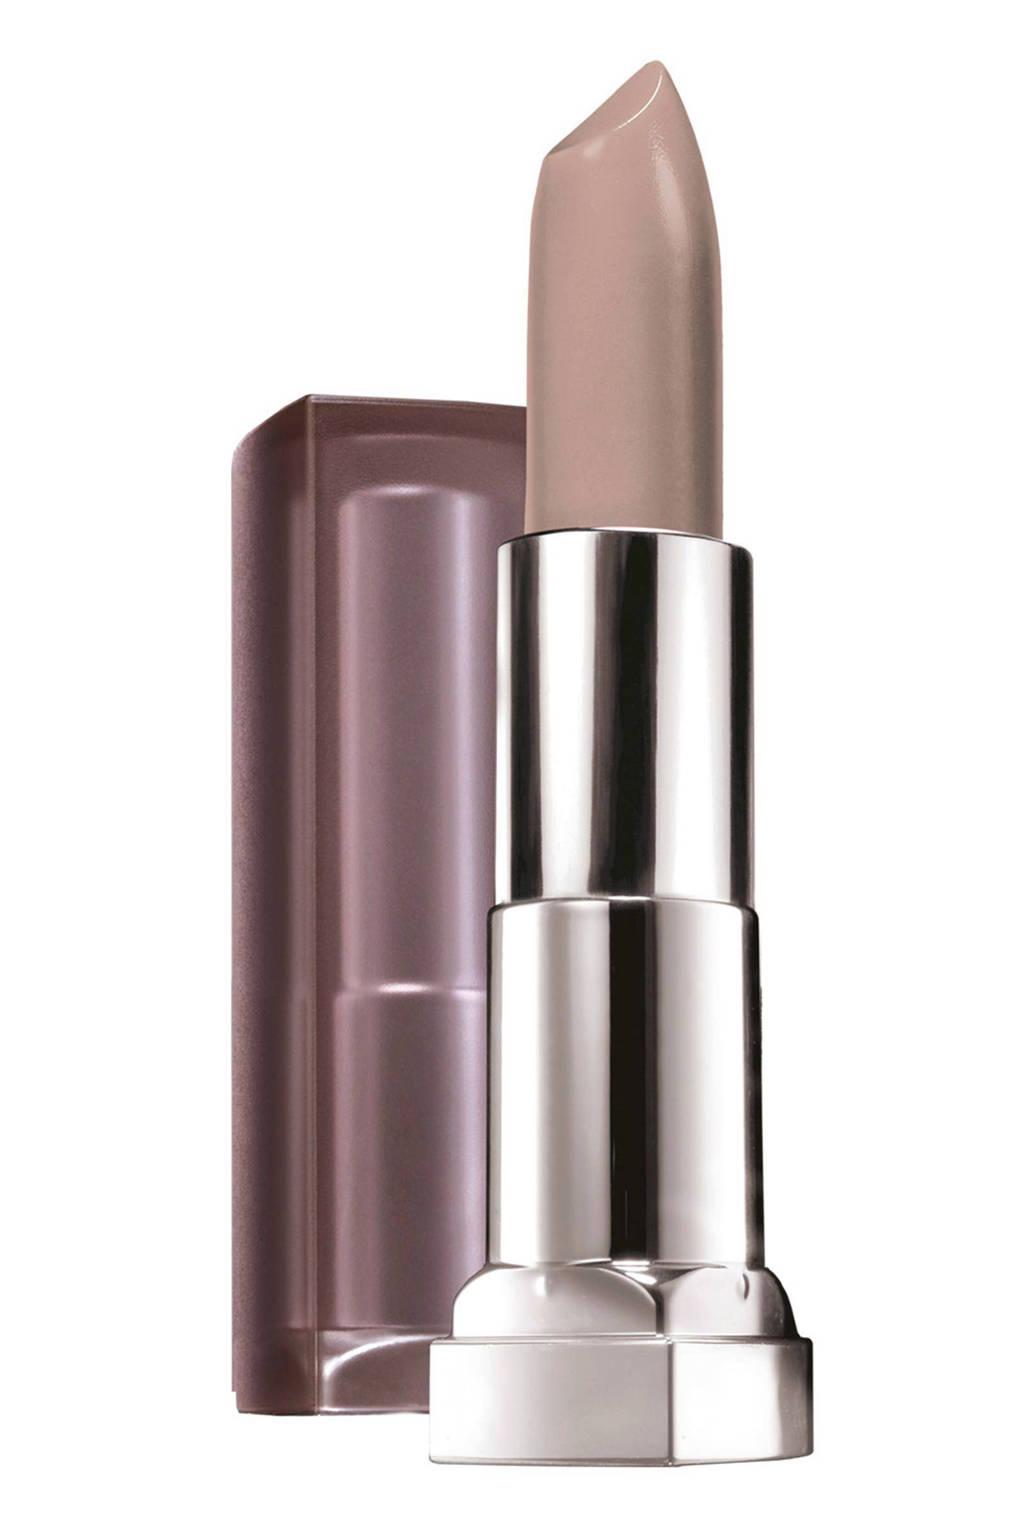 Maybelline New York Color Sensational Mattes - 930 Nude Embrace lippenstift